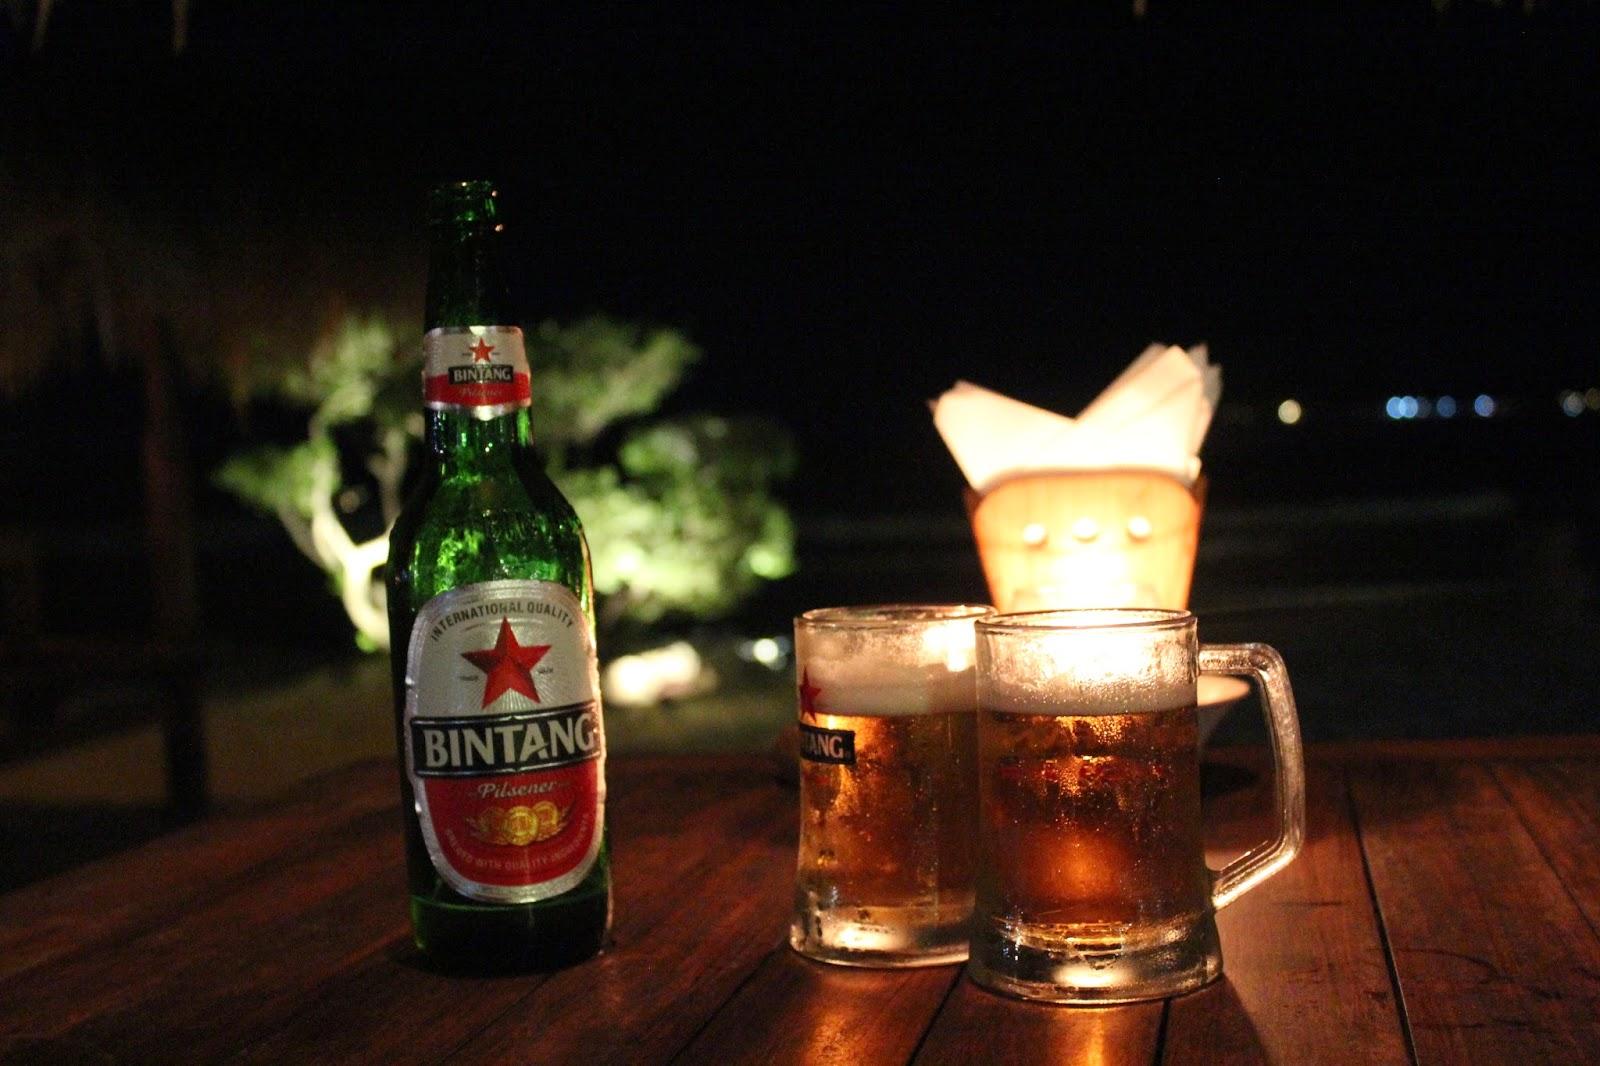 Bintang cerveza